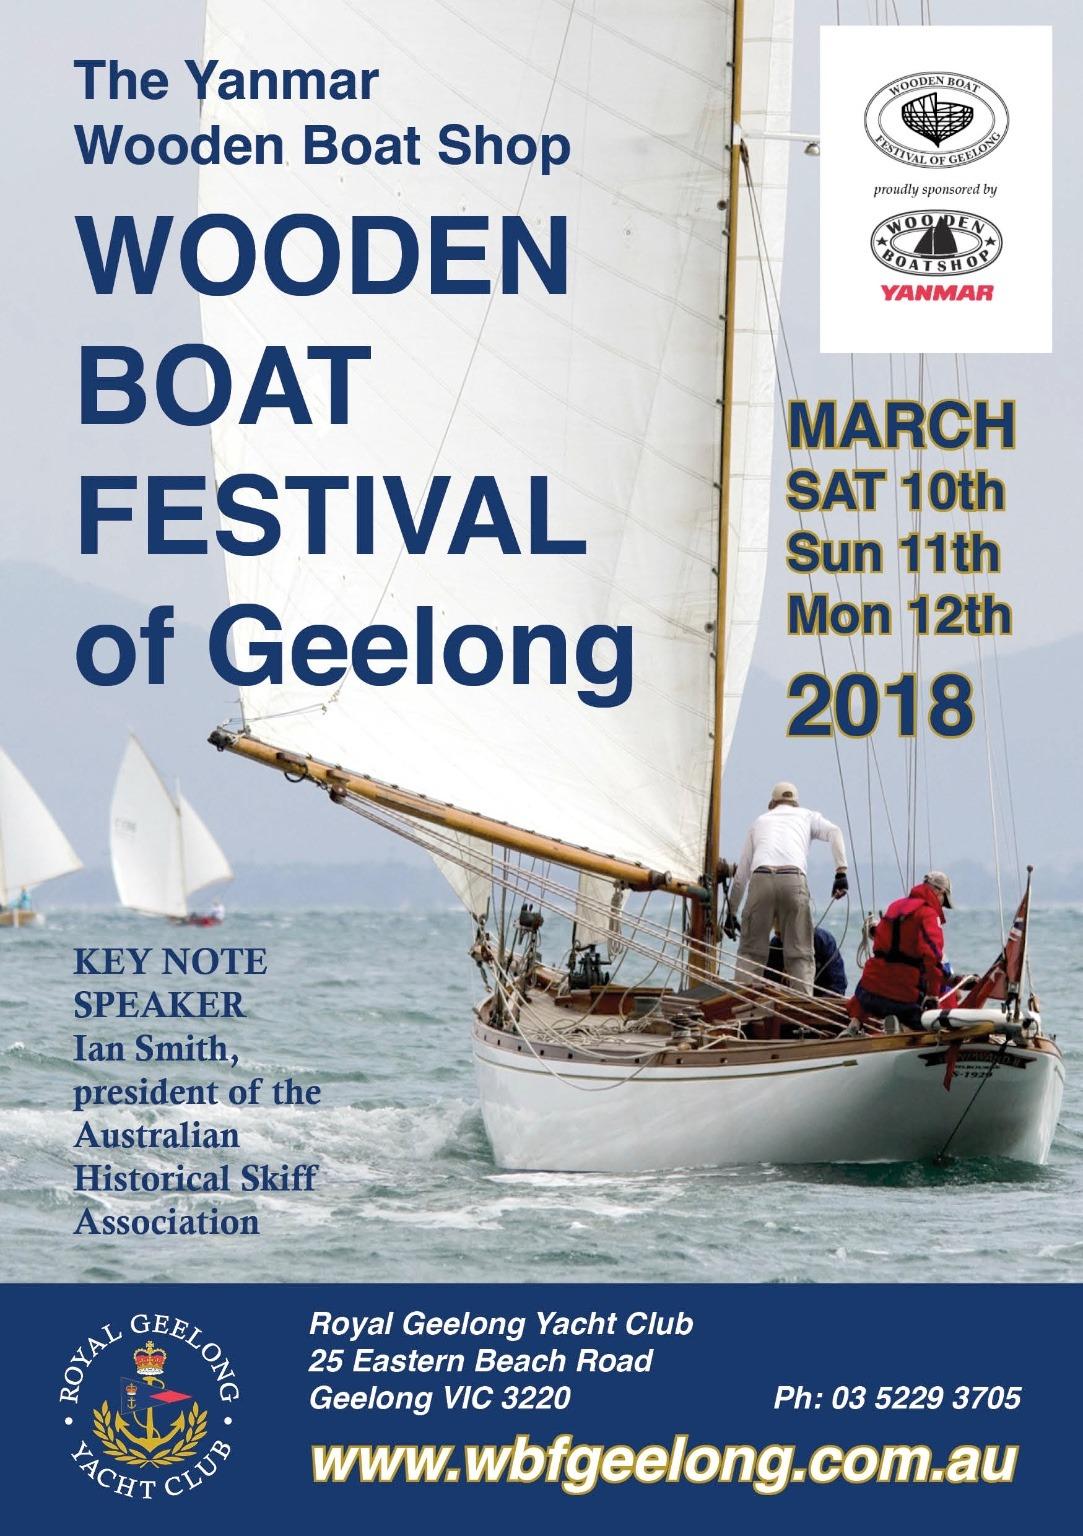 Geelong Wooden Boat Festival Queenscliff Cruising Yacht Club